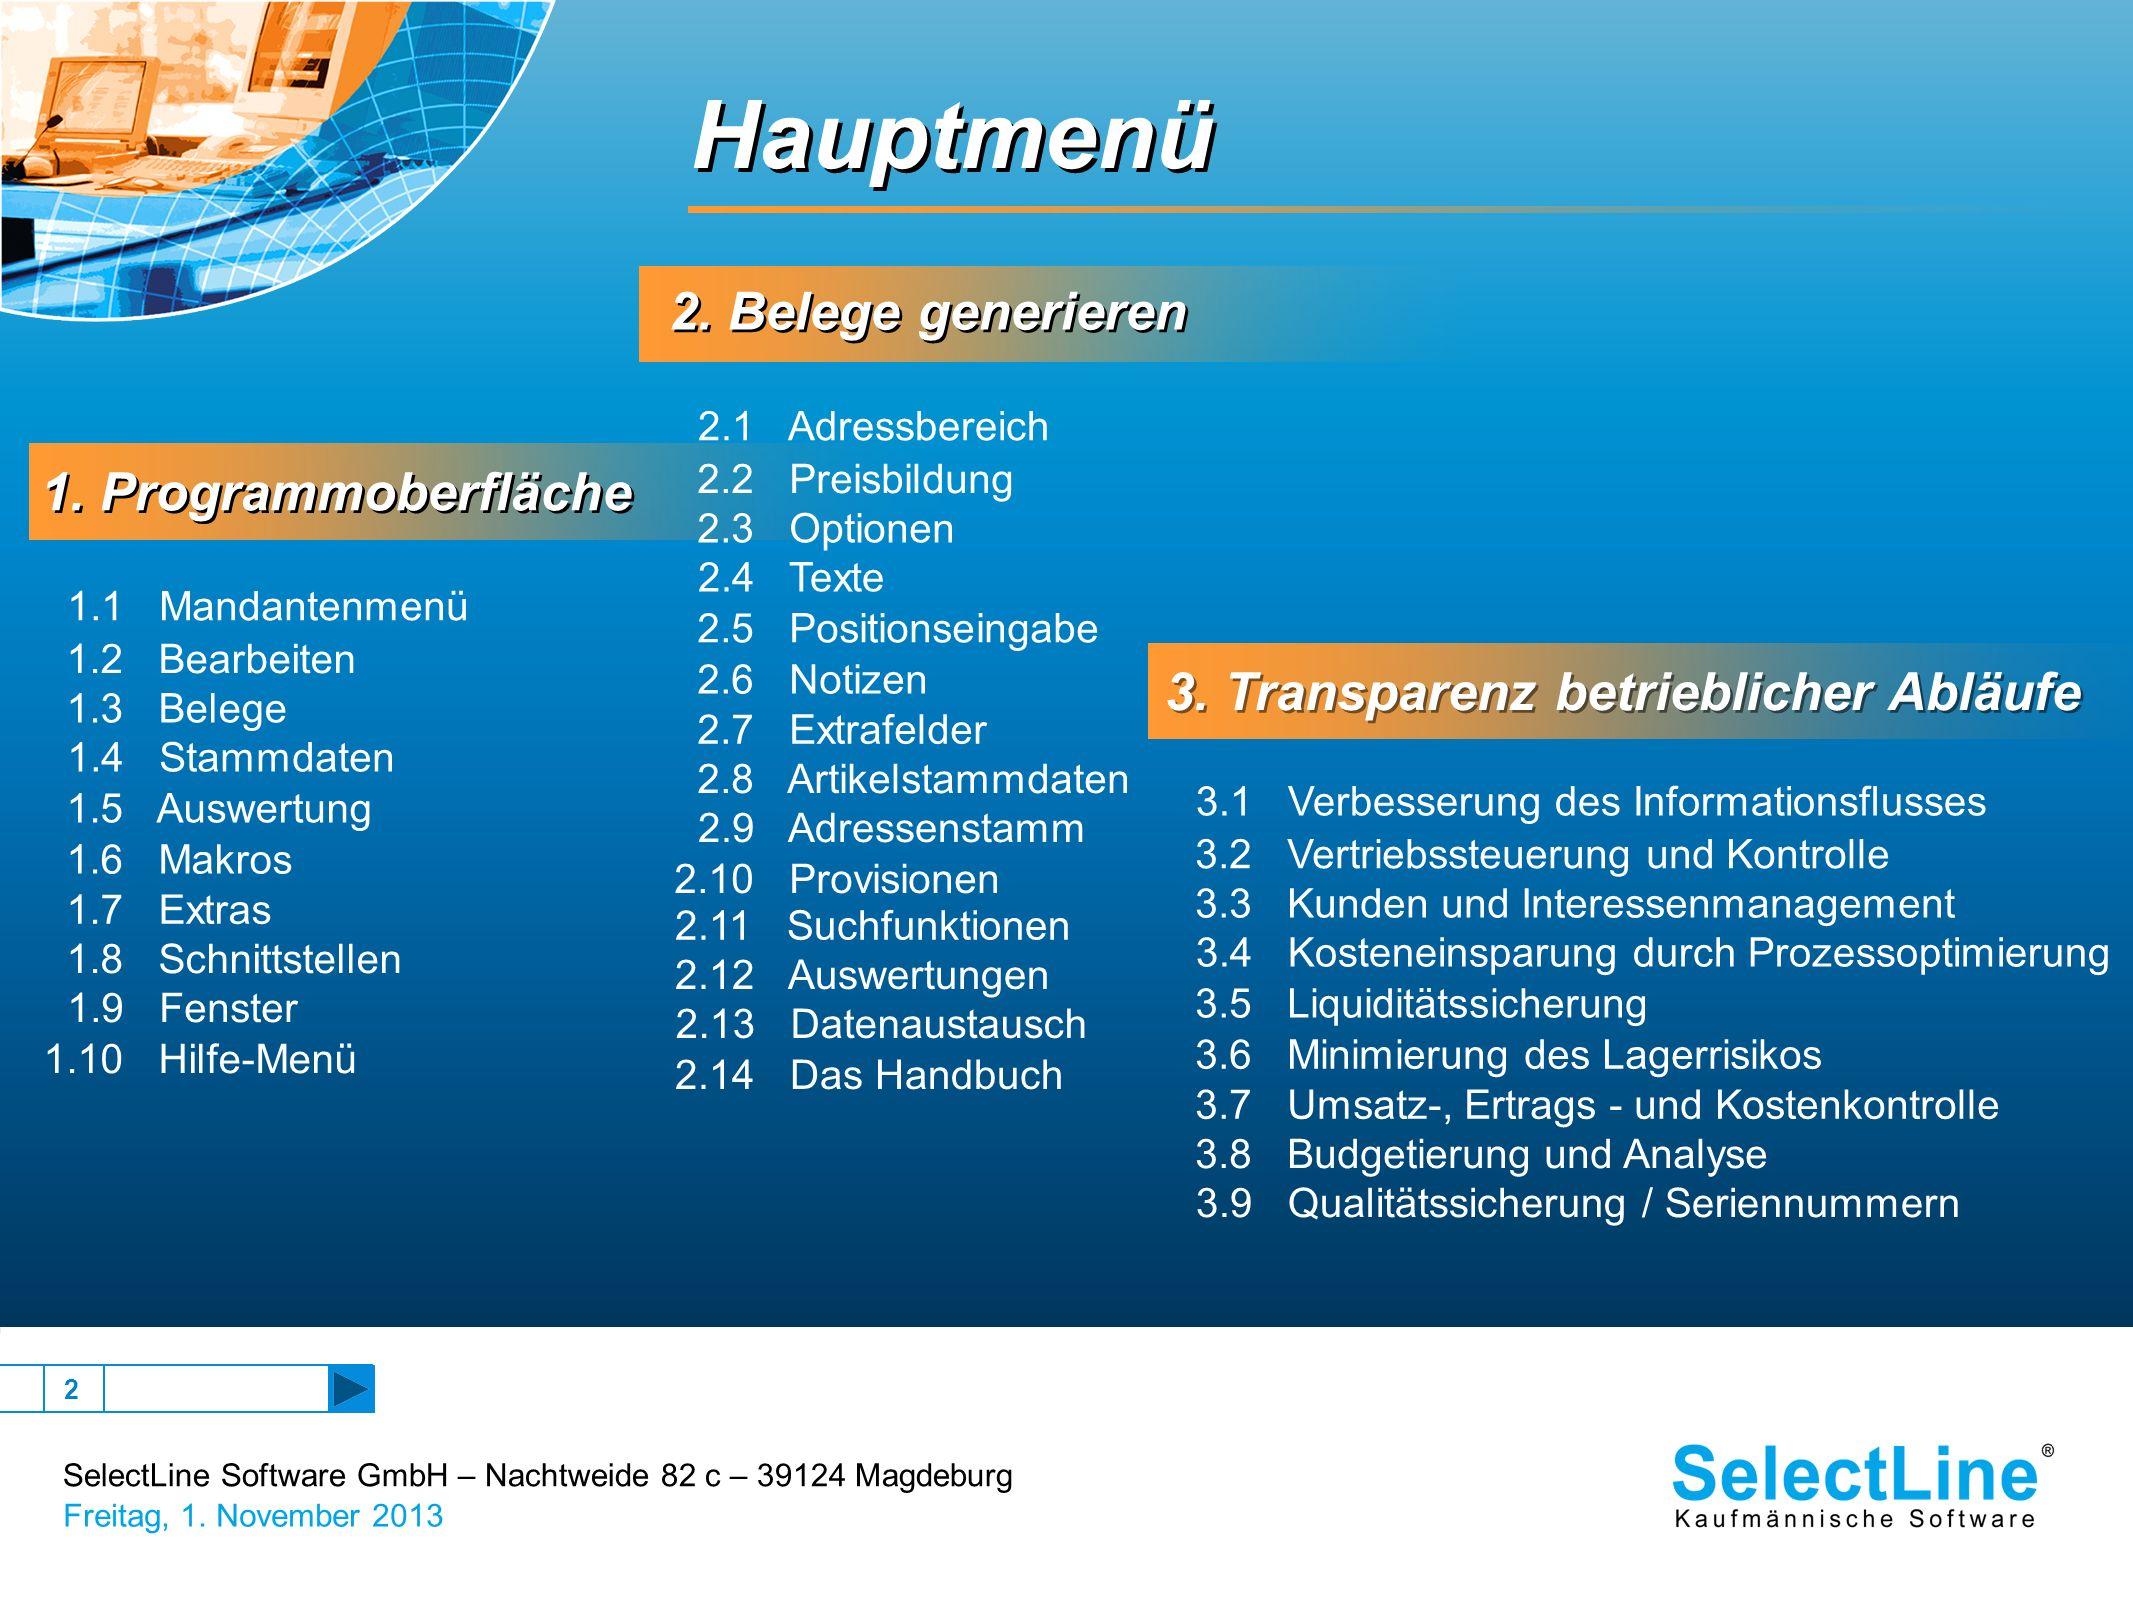 SelectLine Software GmbH – Nachtweide 82 c – 39124 Magdeburg Freitag, 1. November 2013 2 1. Programmoberfläche 1. Programmoberfläche 2. Belege generie